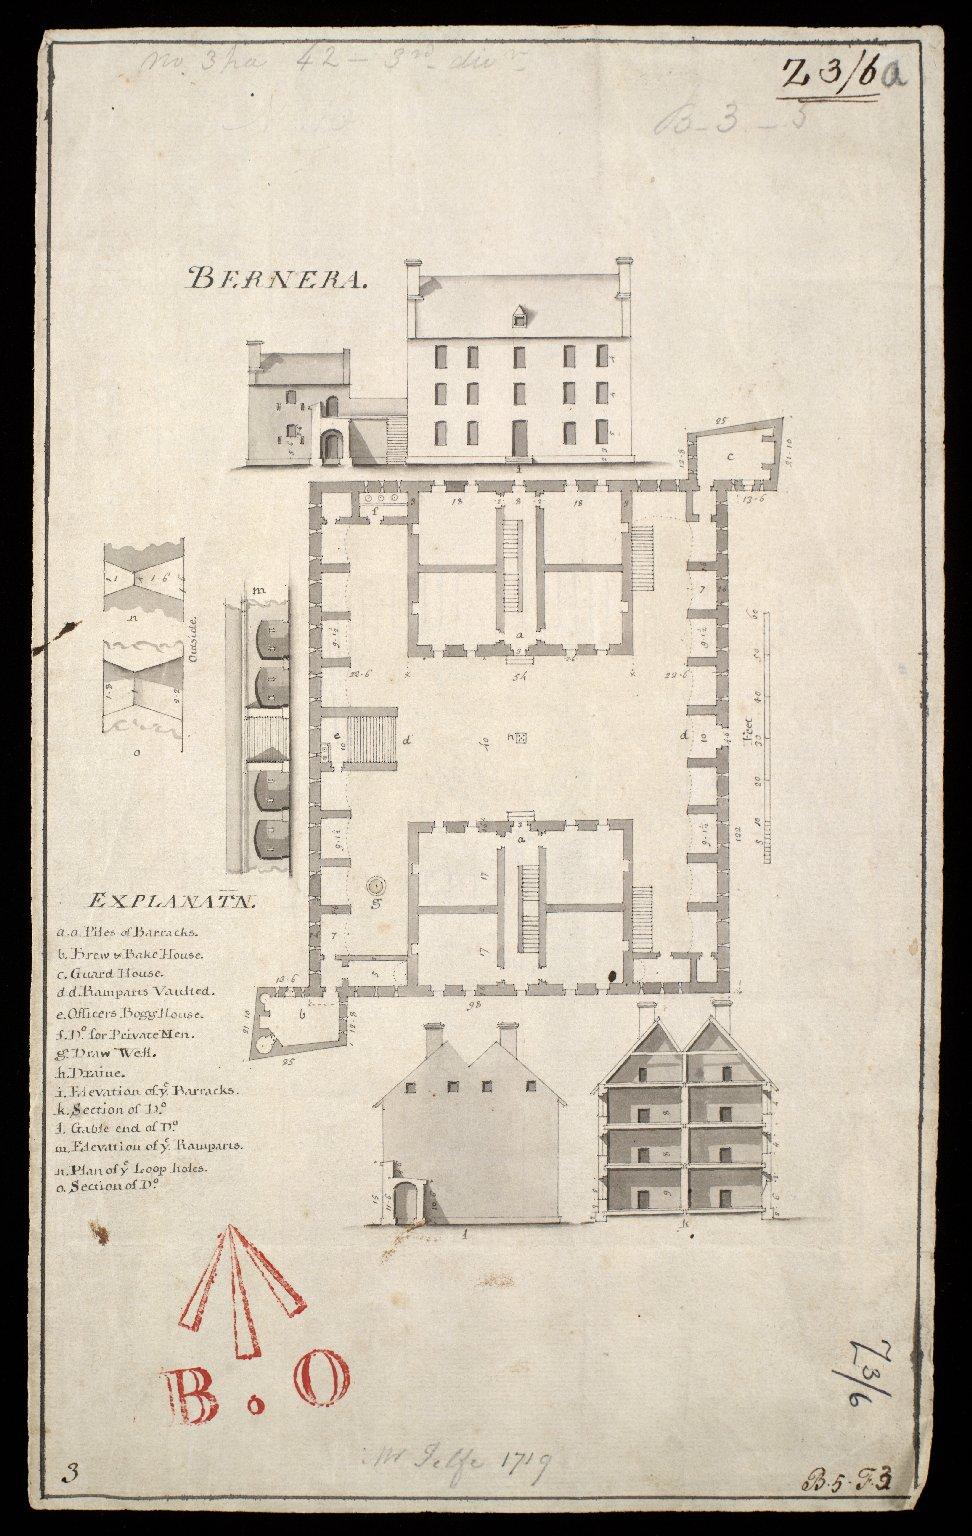 Bernera [1719] [1 of 1]